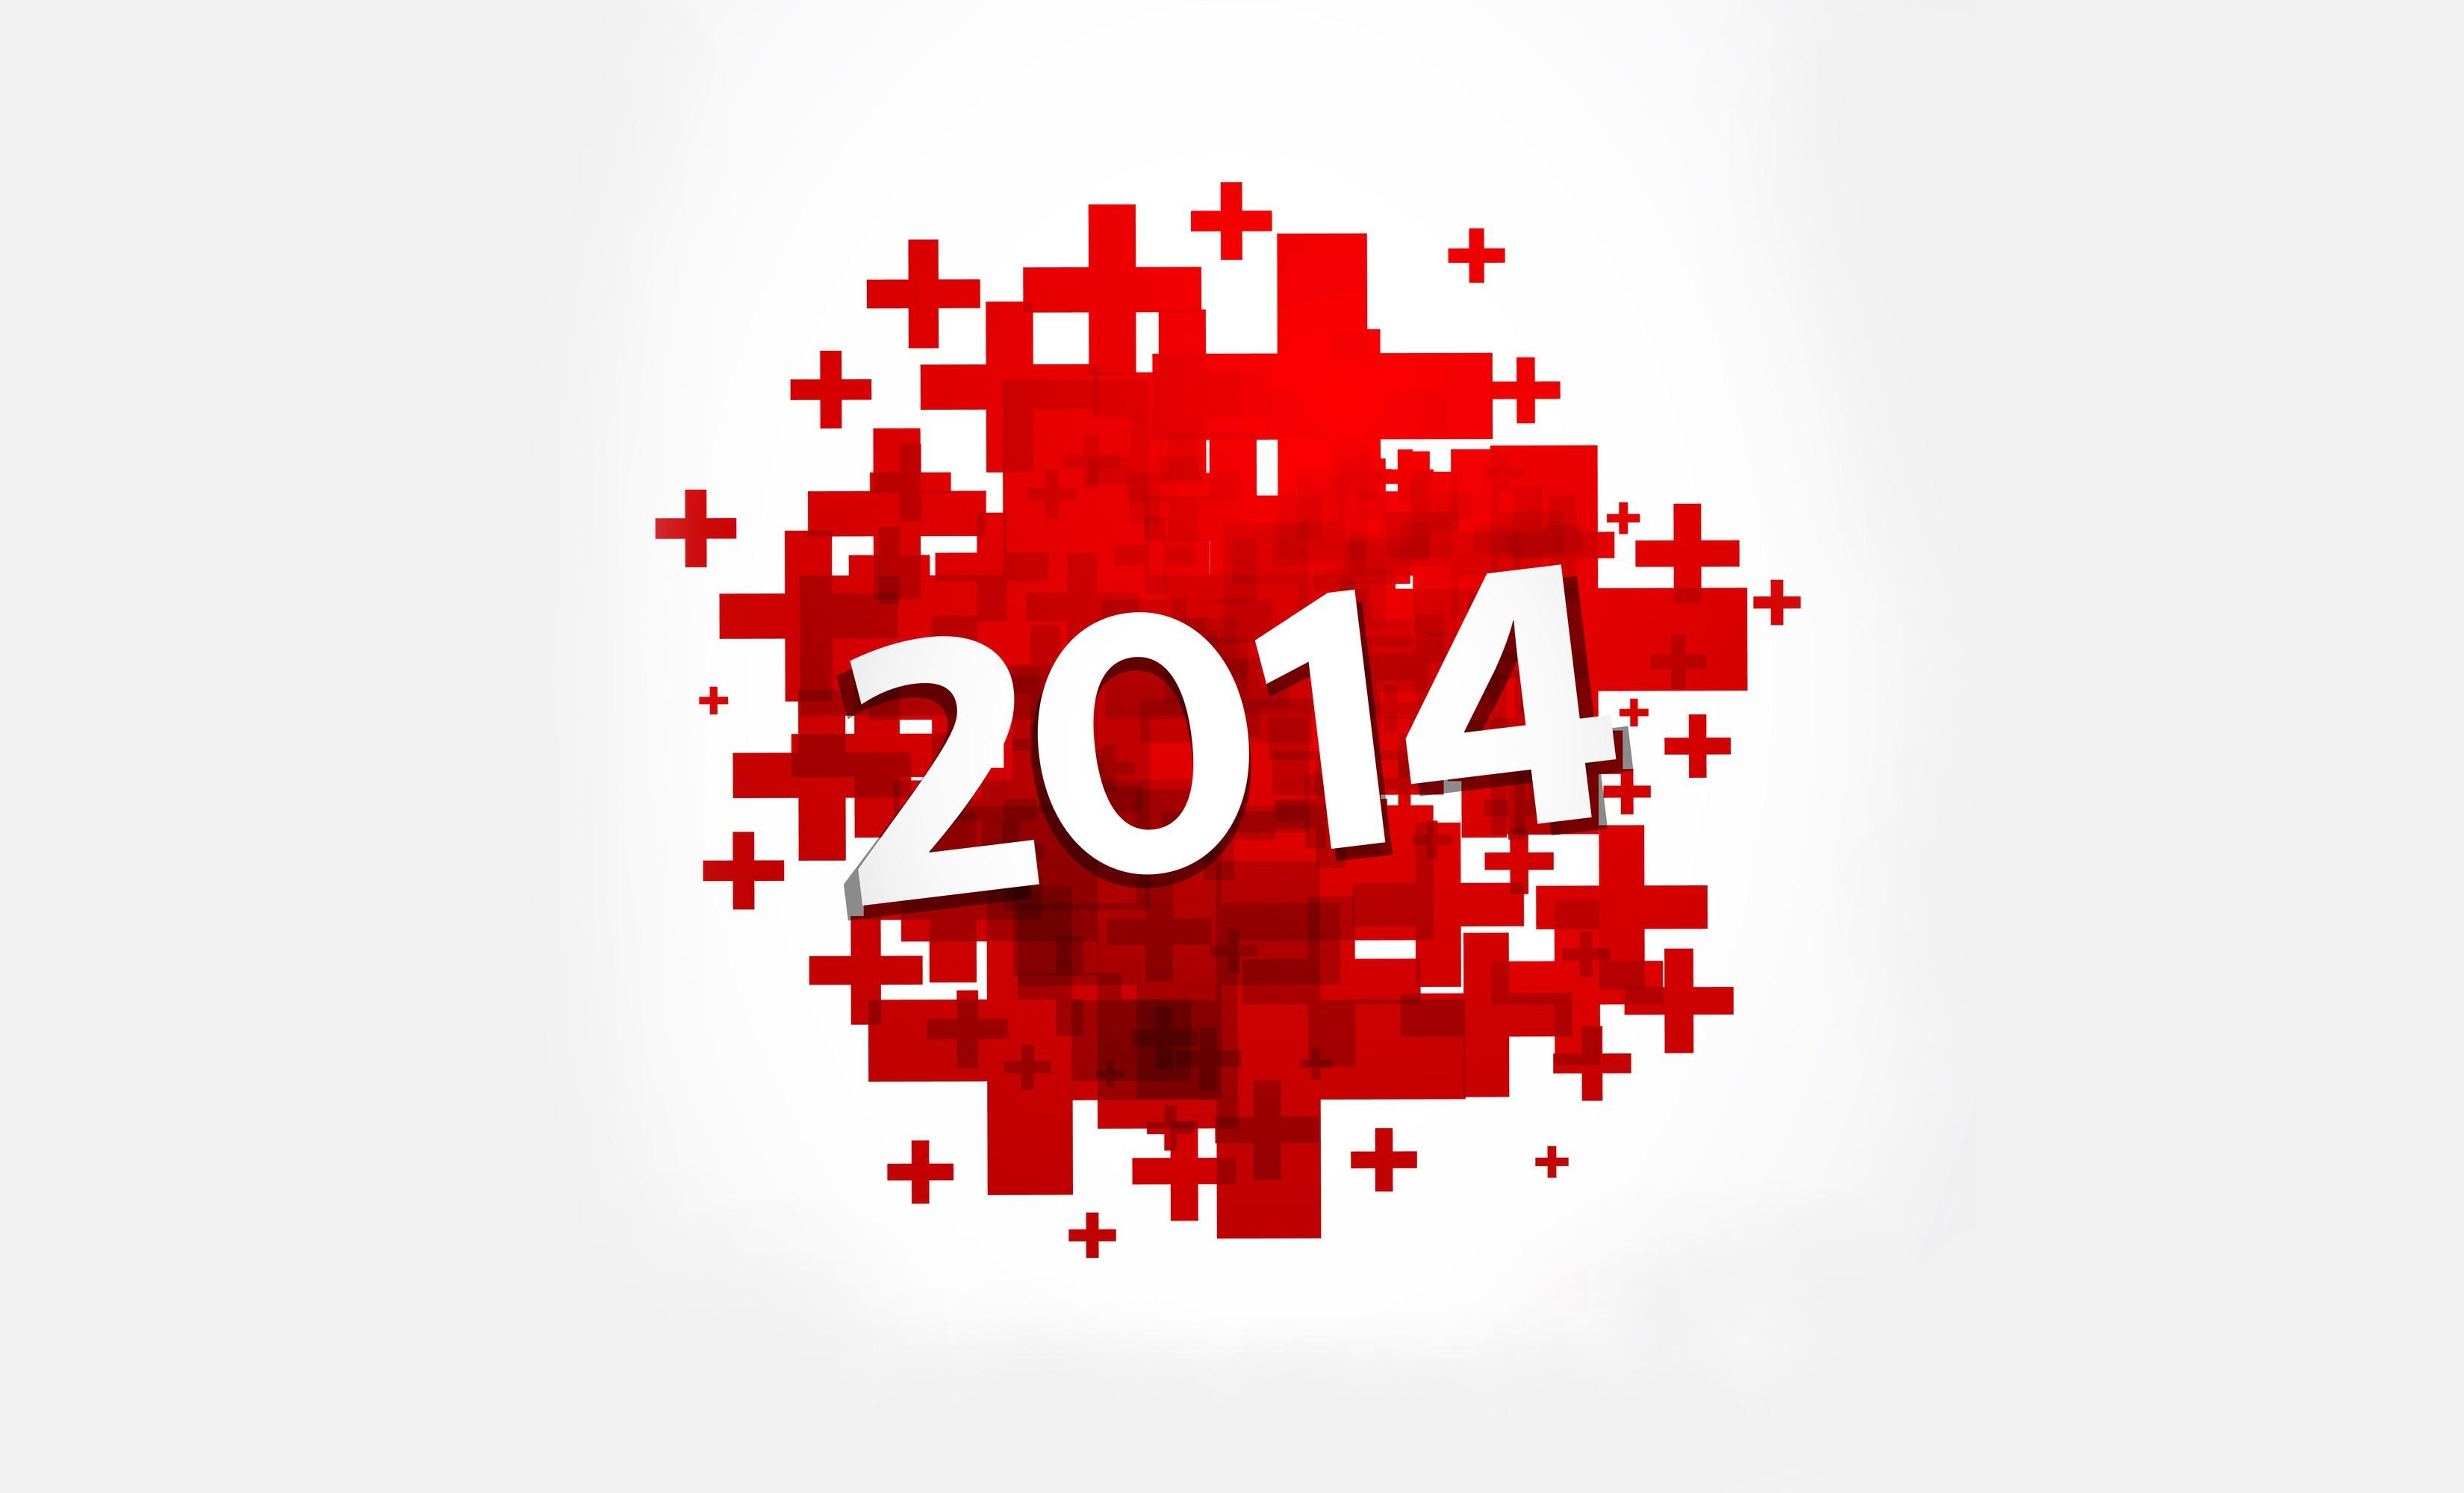 Année 2014 - capjuniors